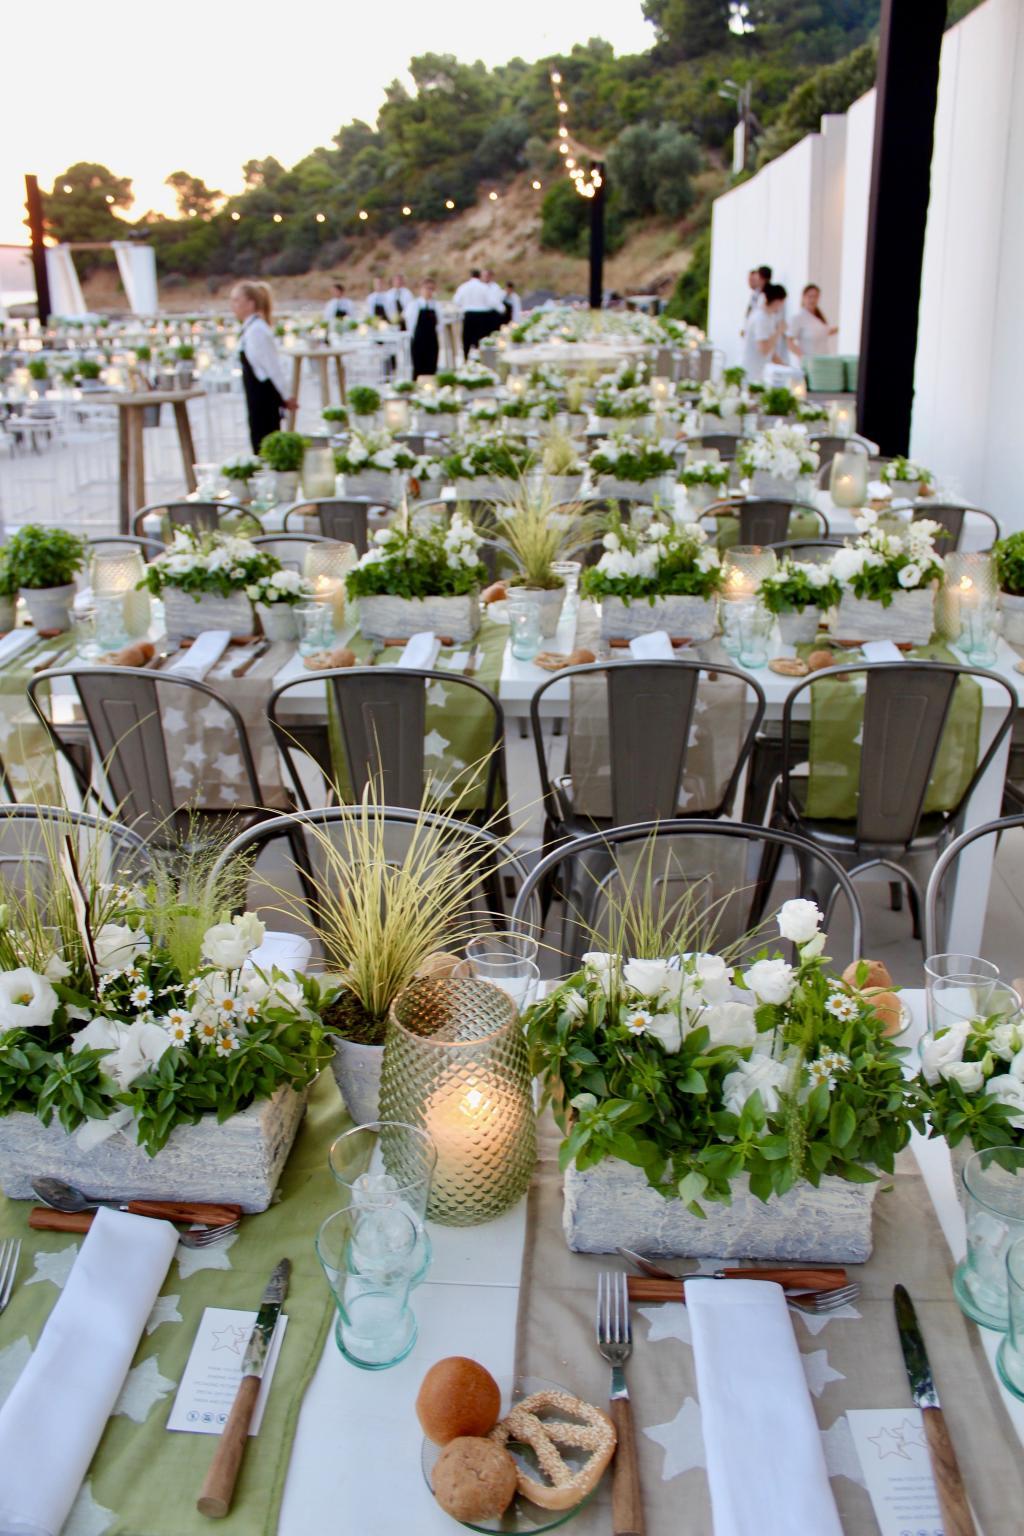 K&K Skiathos wedding - Image 18